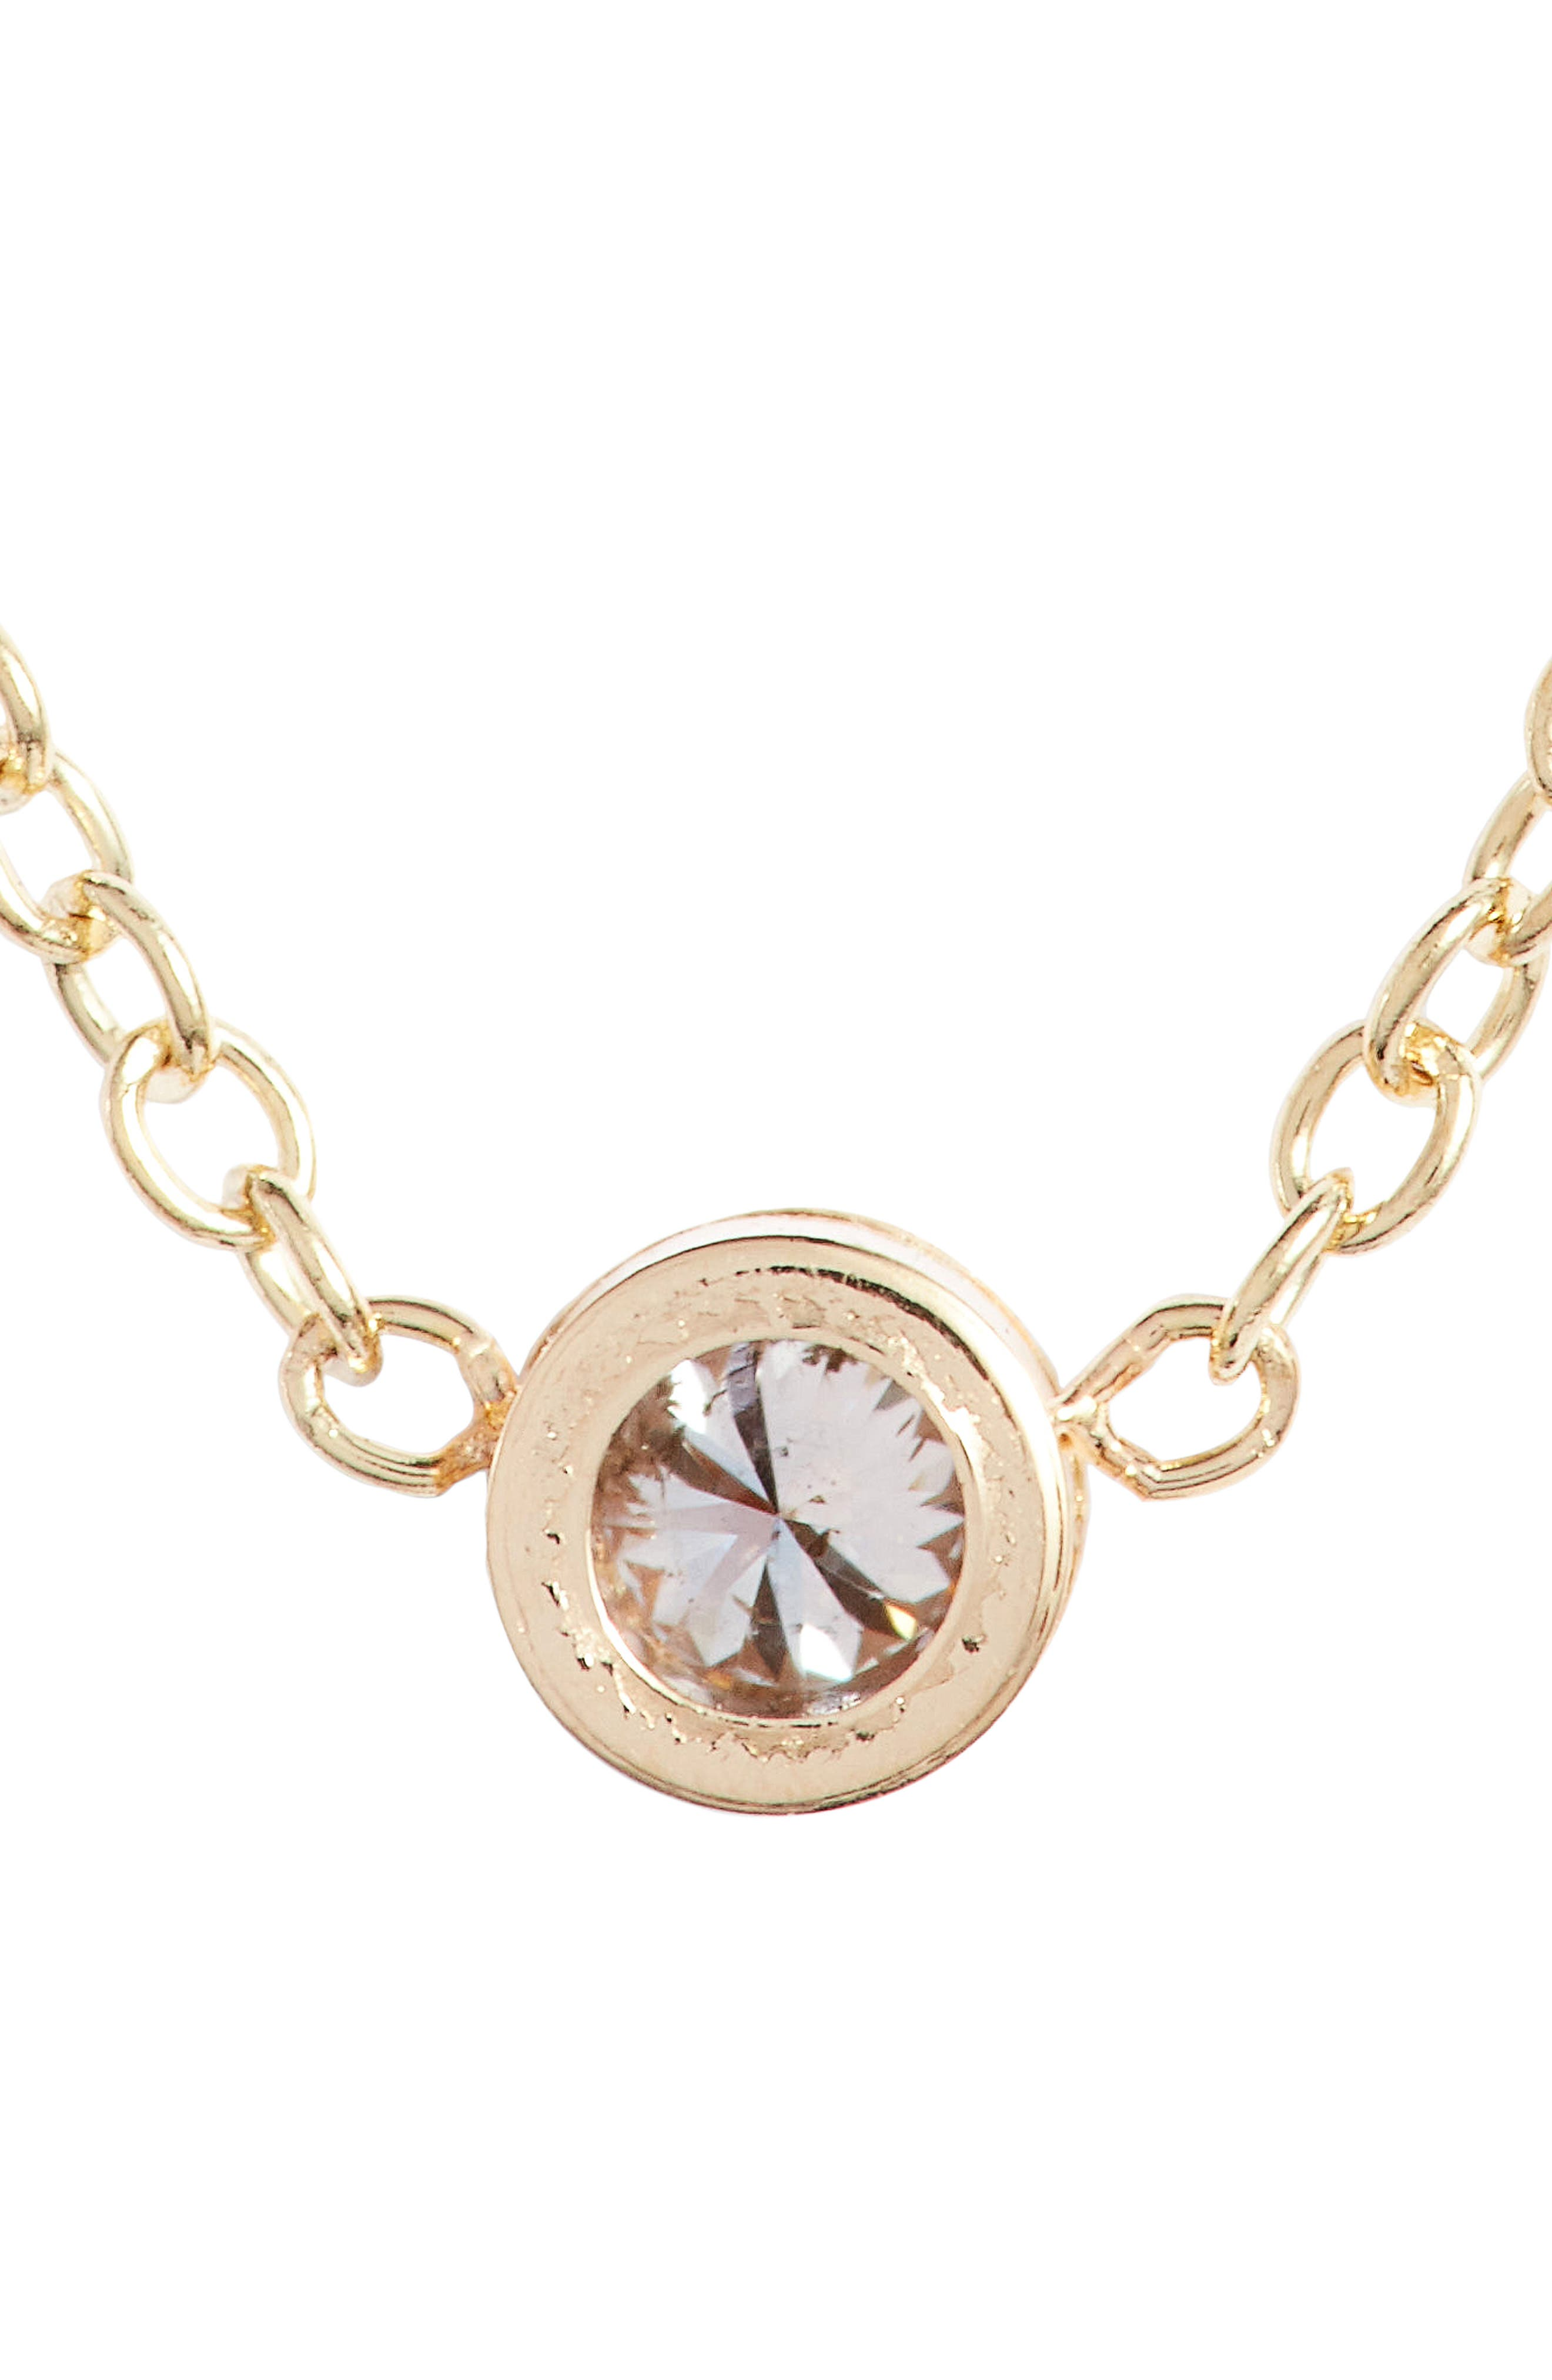 Diamond Bezel Pendant Necklace,                             Alternate thumbnail 5, color,                             YELLOW GOLD